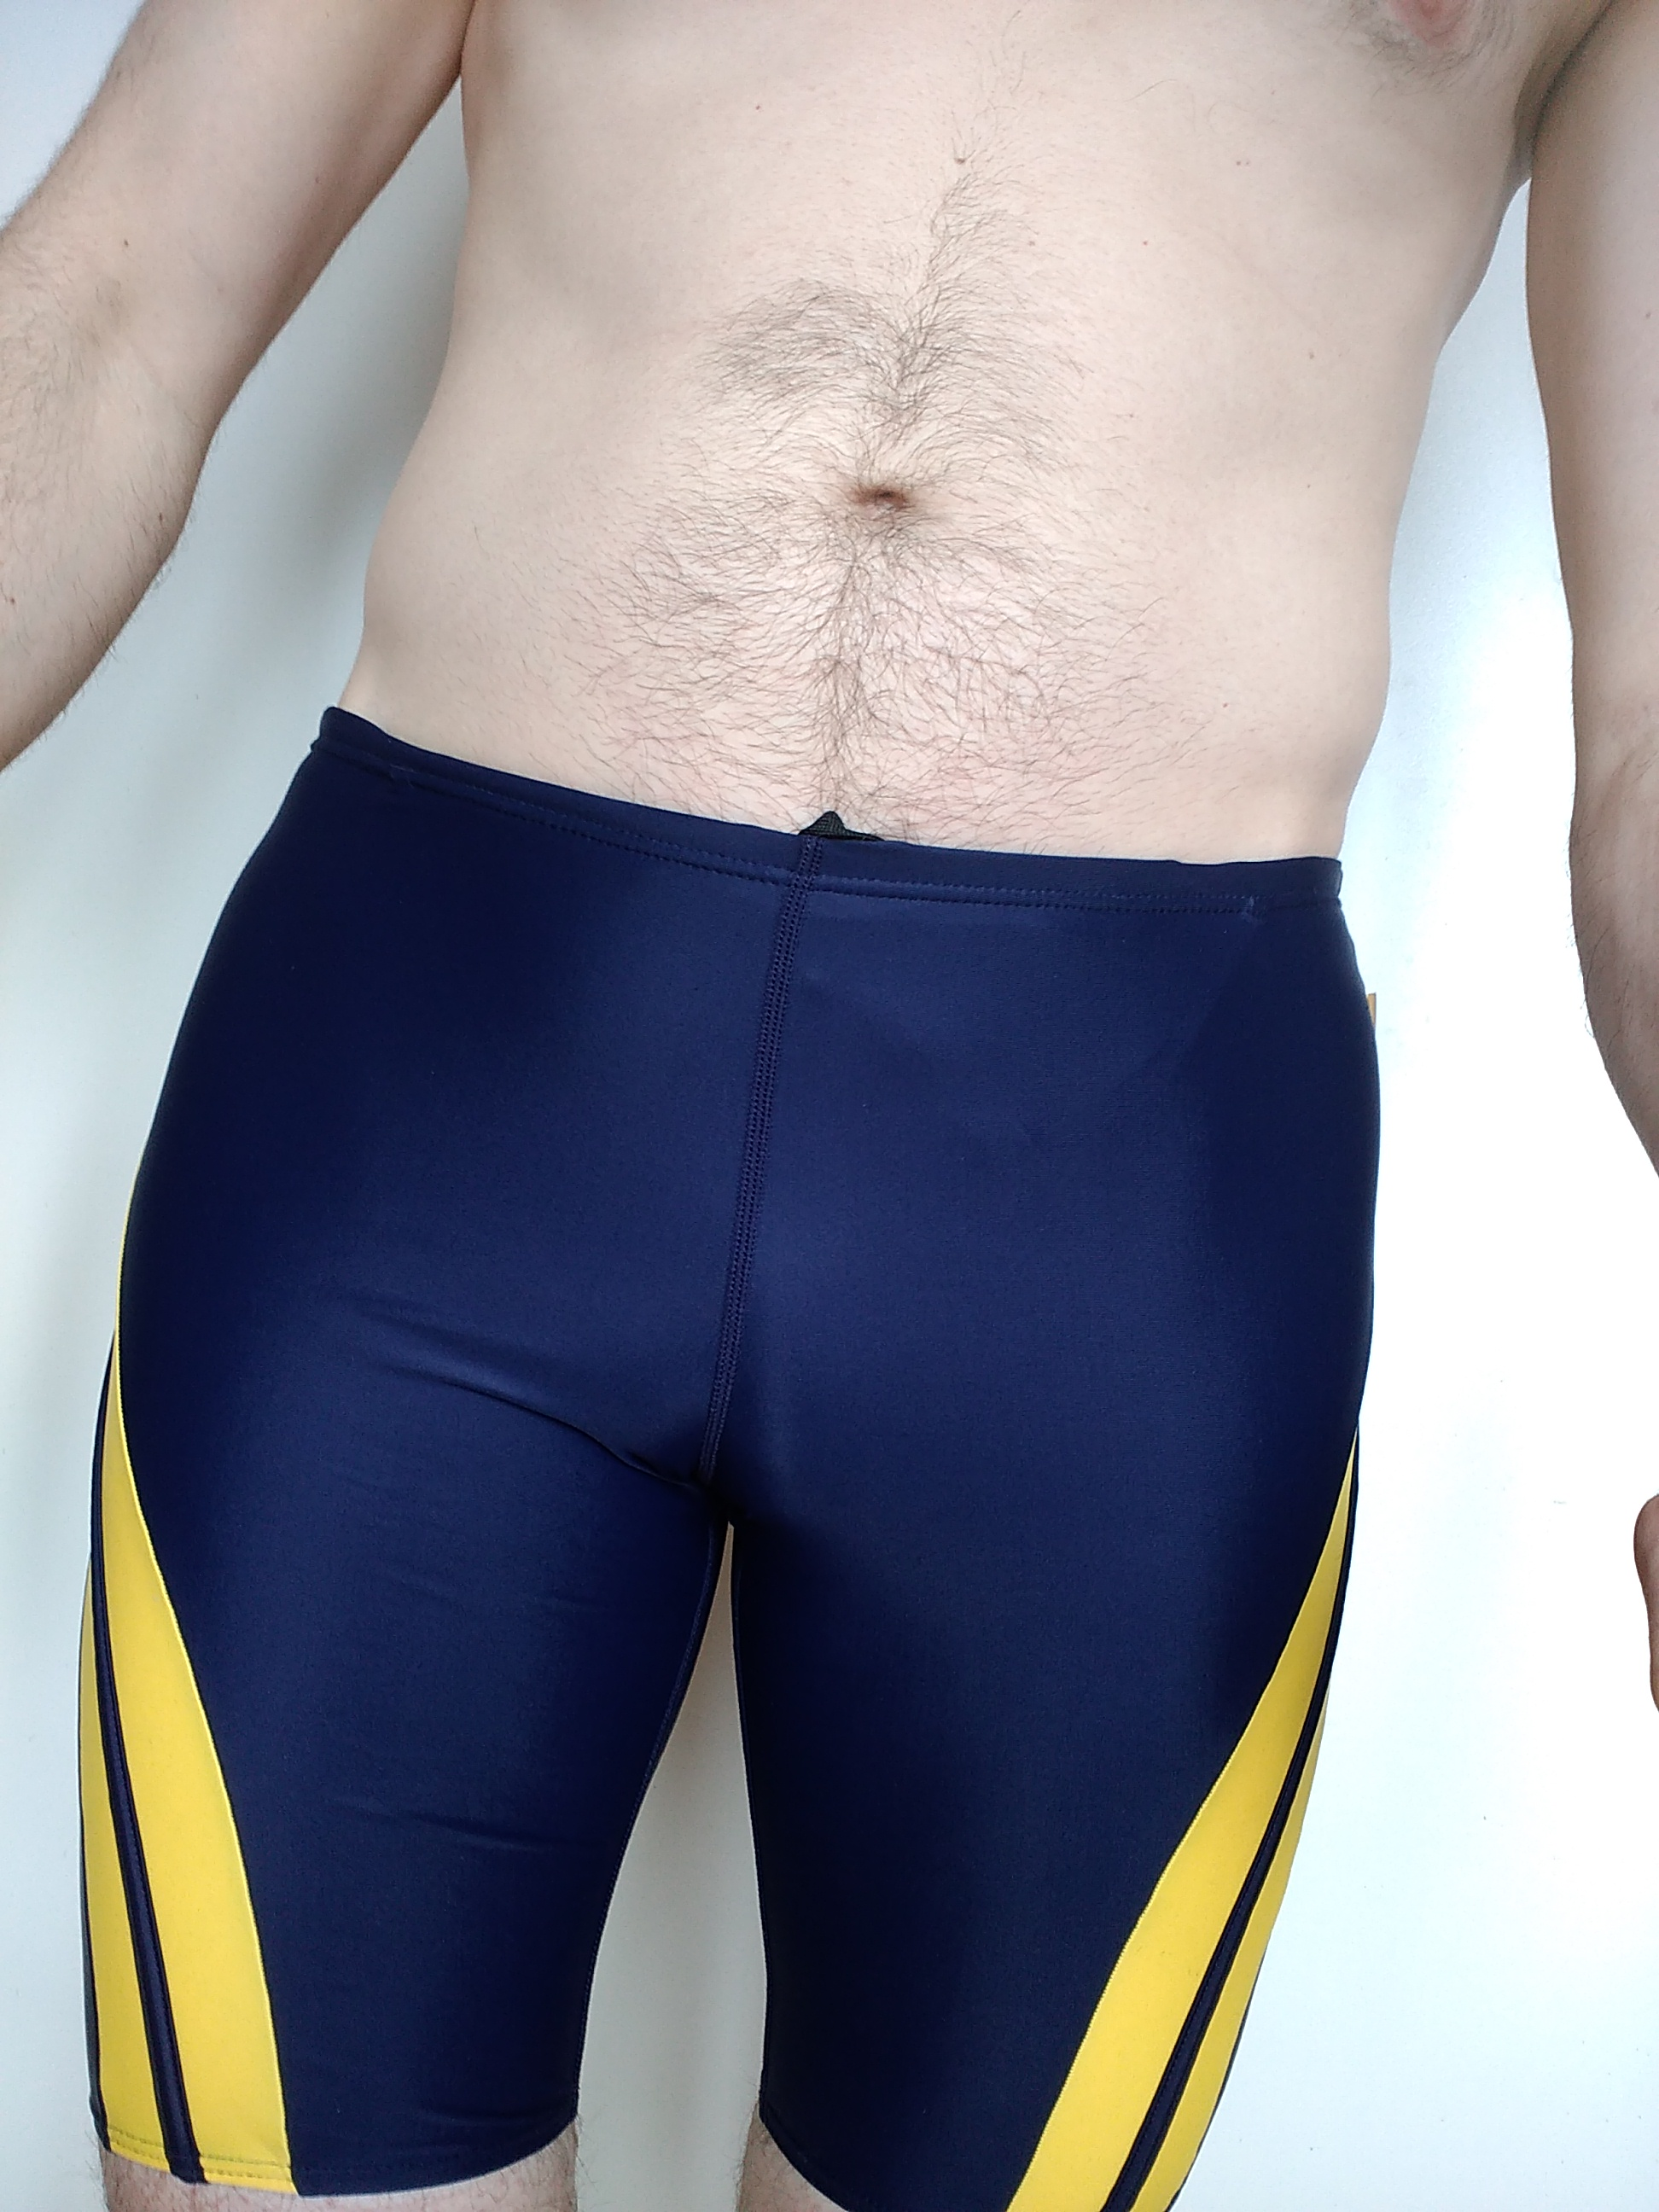 b0a7a3d4ee92 The Finals Reactor Splice Jammer Swimsuit